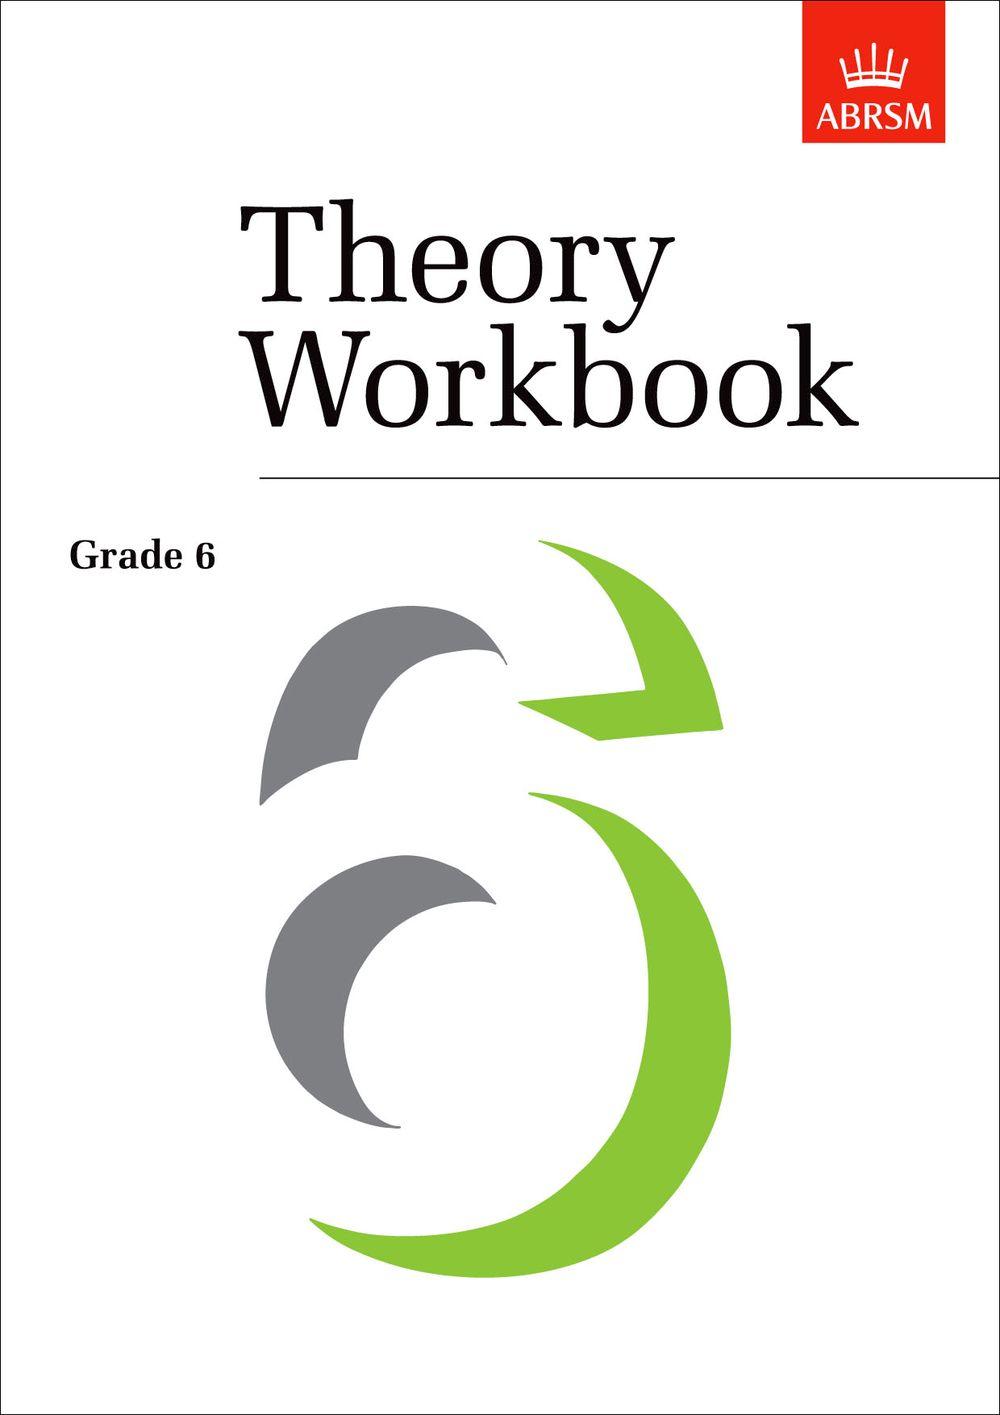 Theory Workbook Grade 6: Theory